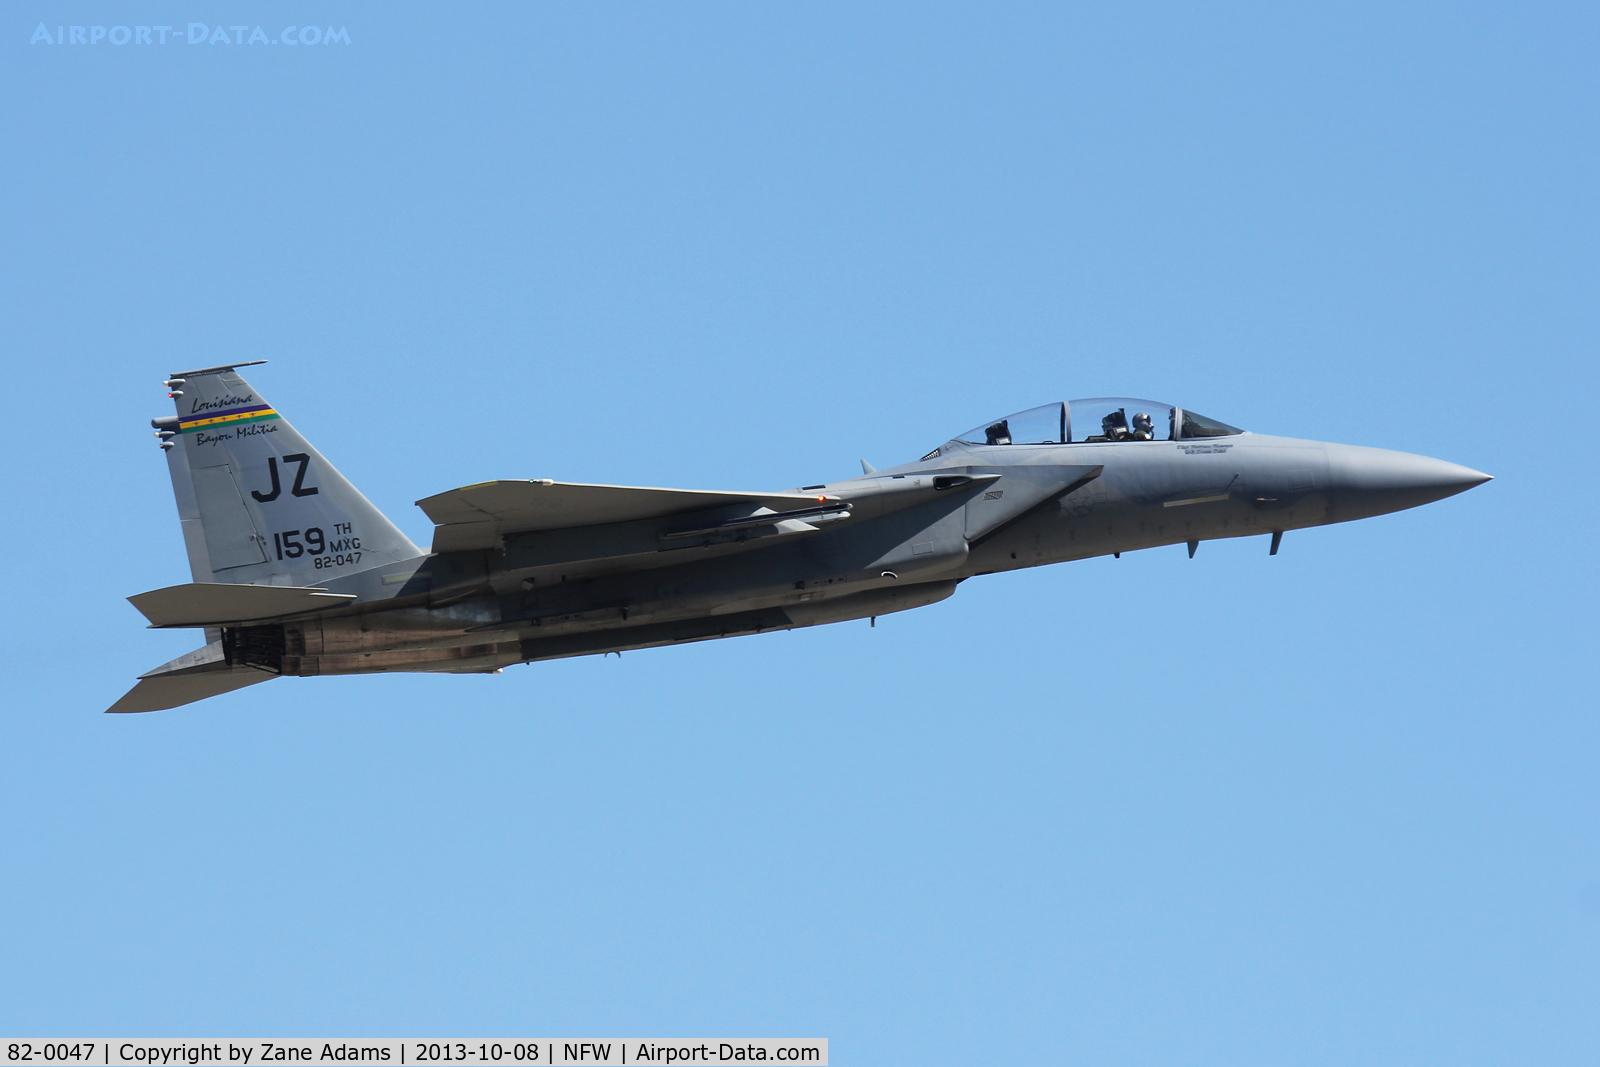 82-0047, 1982 McDonnell Douglas F-15D Eagle C/N 0845/D043, Departing NAS Fort Worth